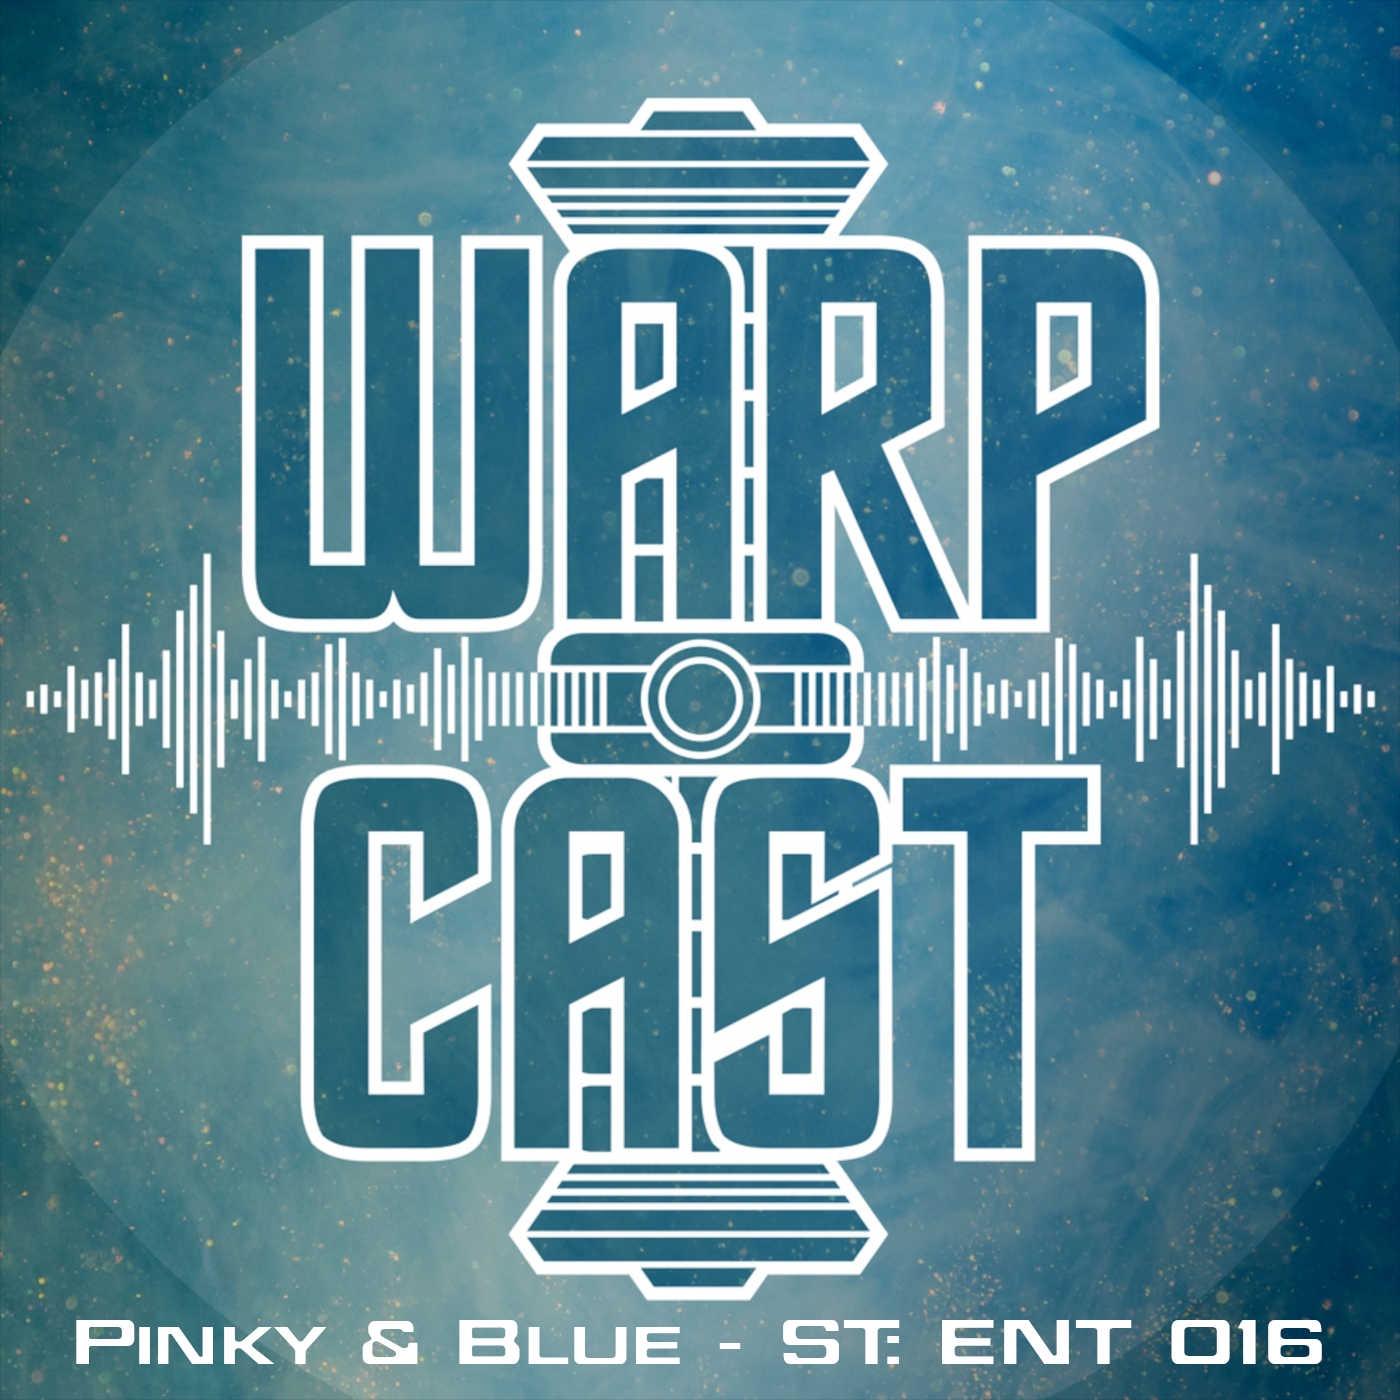 Pinky & Blue - ST: ENT 016 - Shuttlepod One